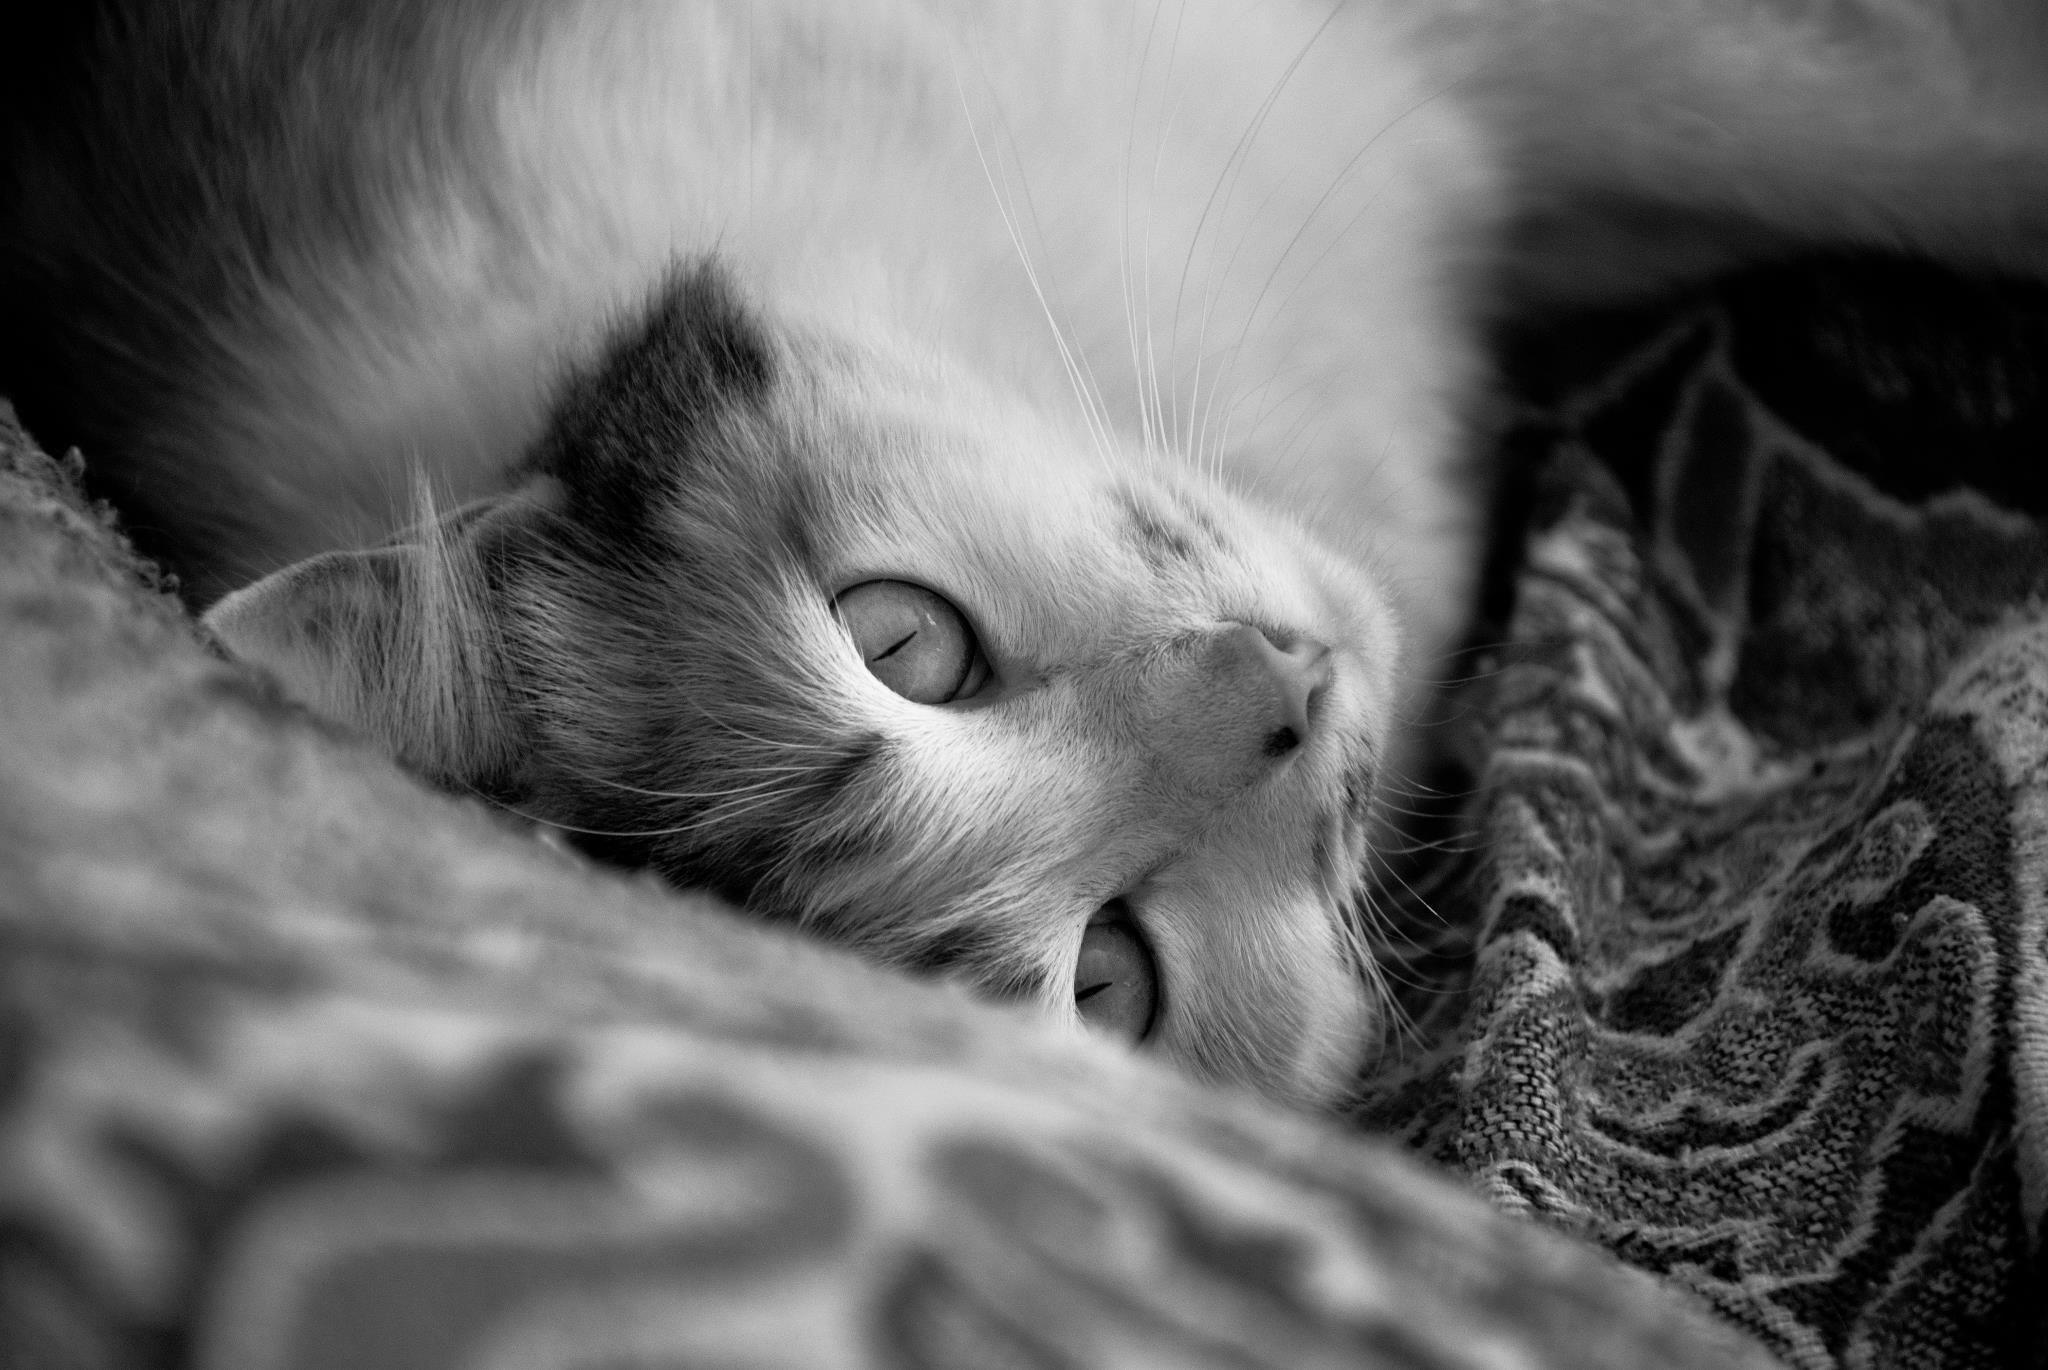 Ela vive pousando para ser fotografada rsrs #cat #Alice #fotografiaPB #petbook